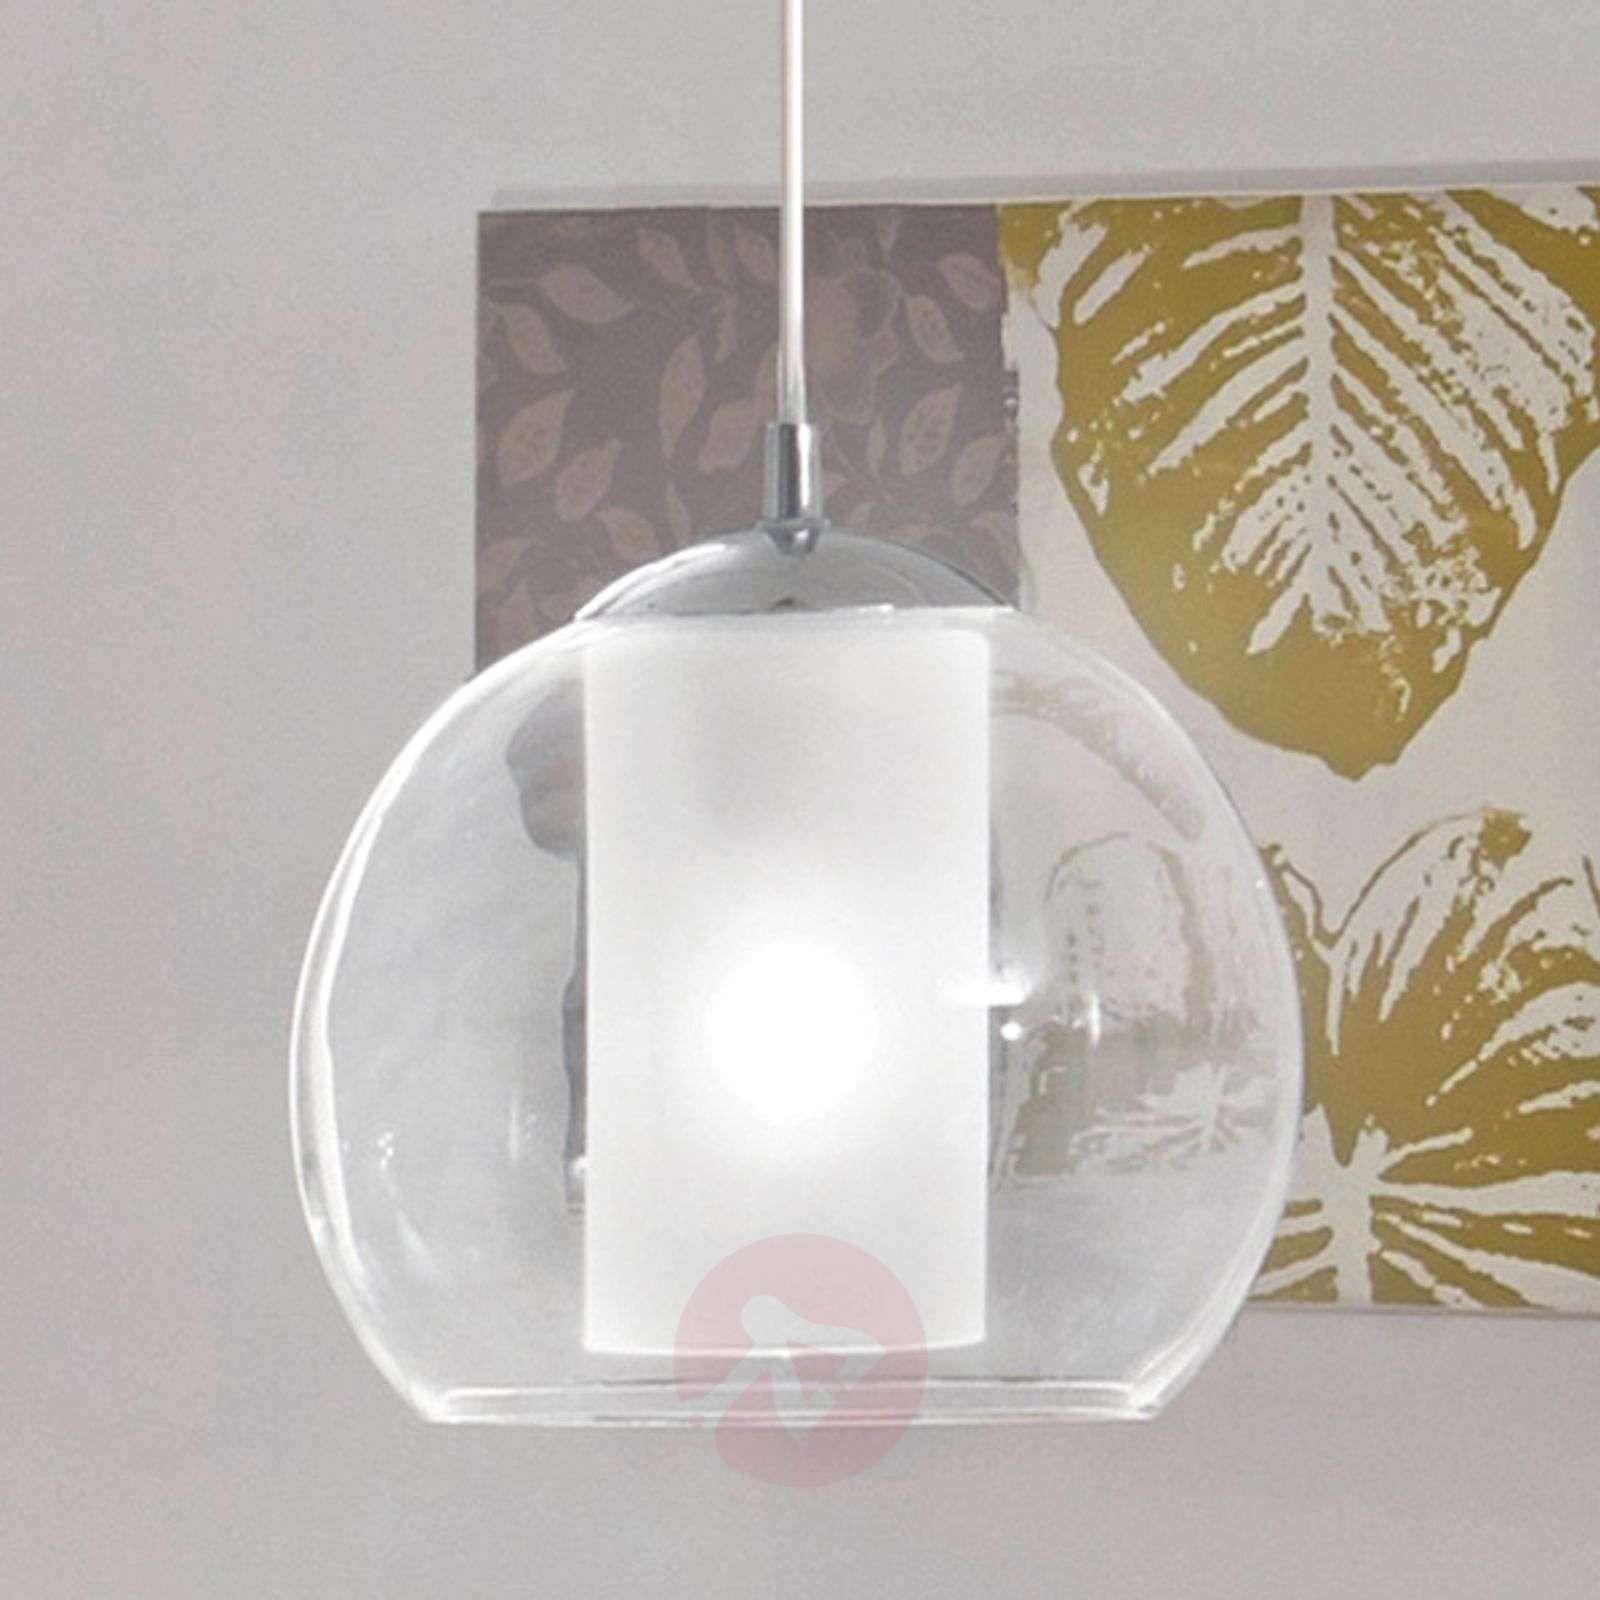 Classic Bolsano glass pendant light-3031643-01